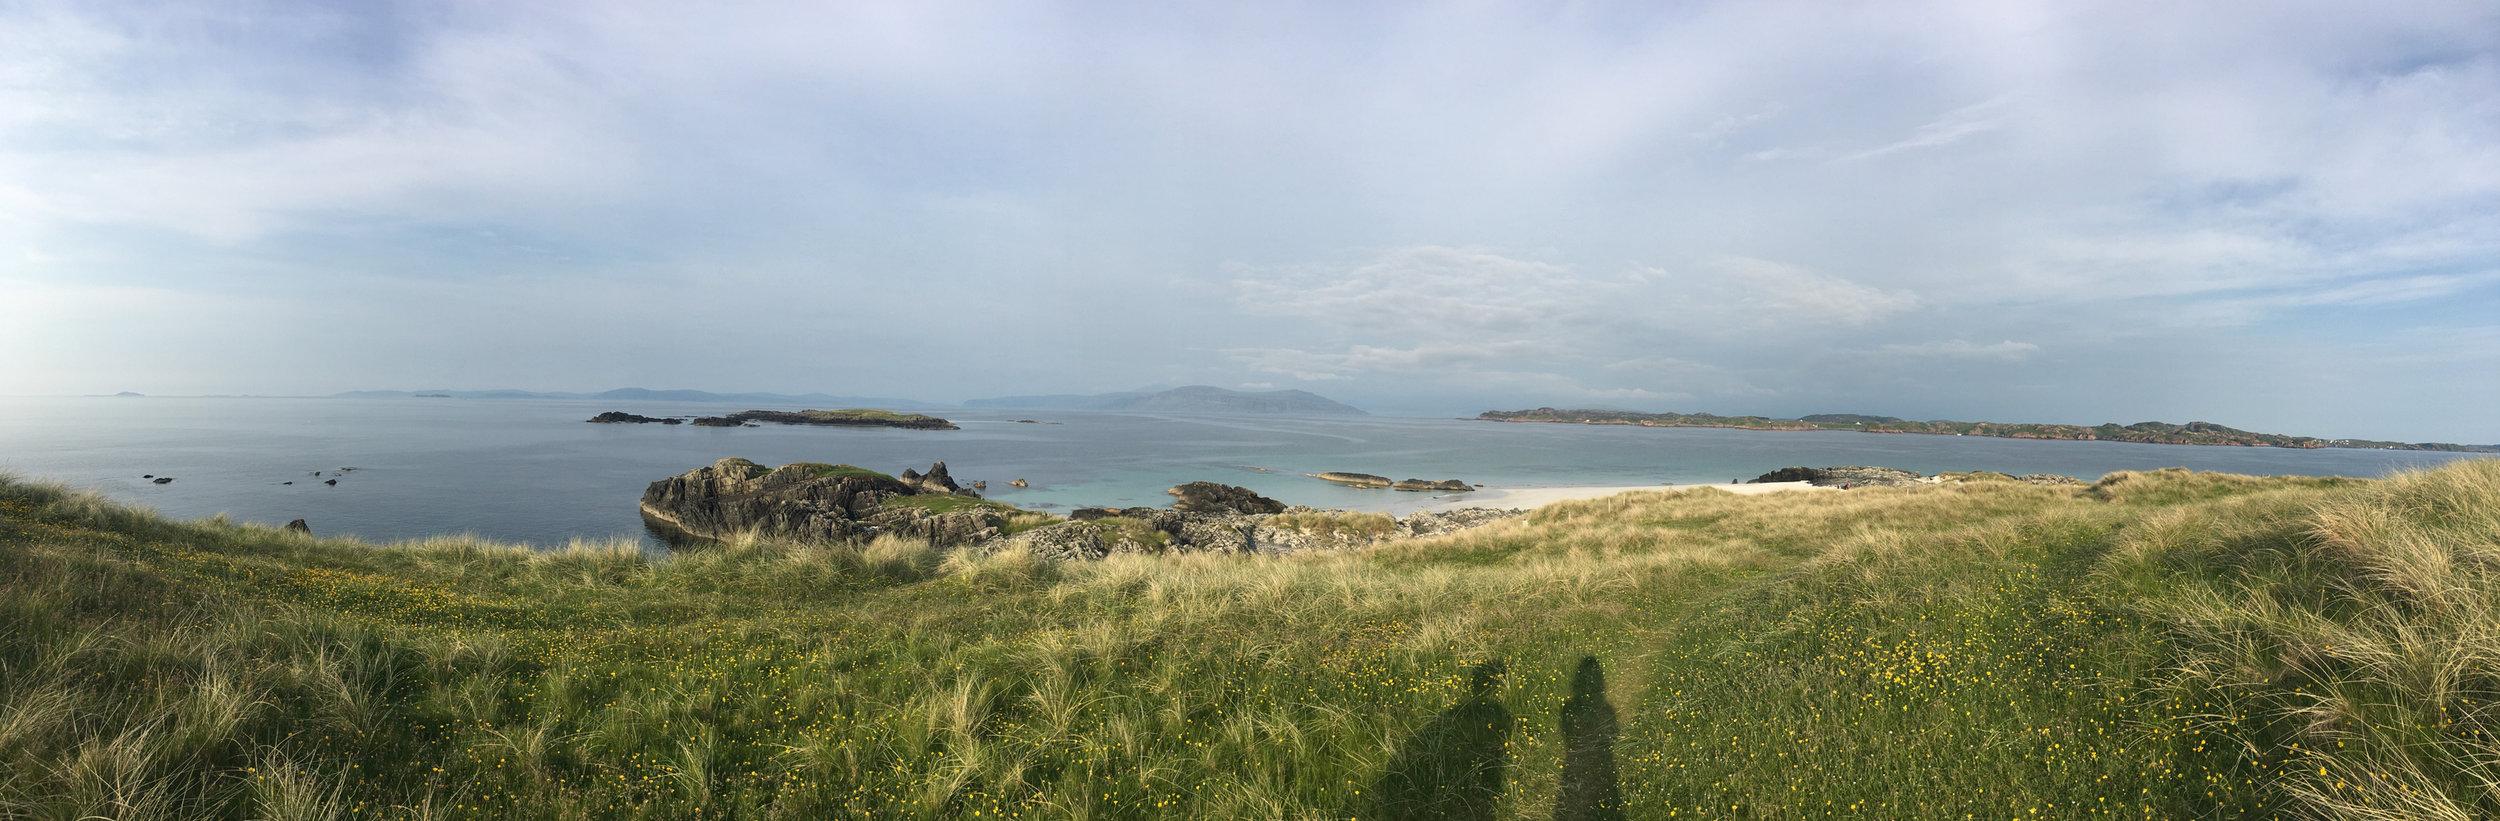 Isle of Iona, Scotland.jpg